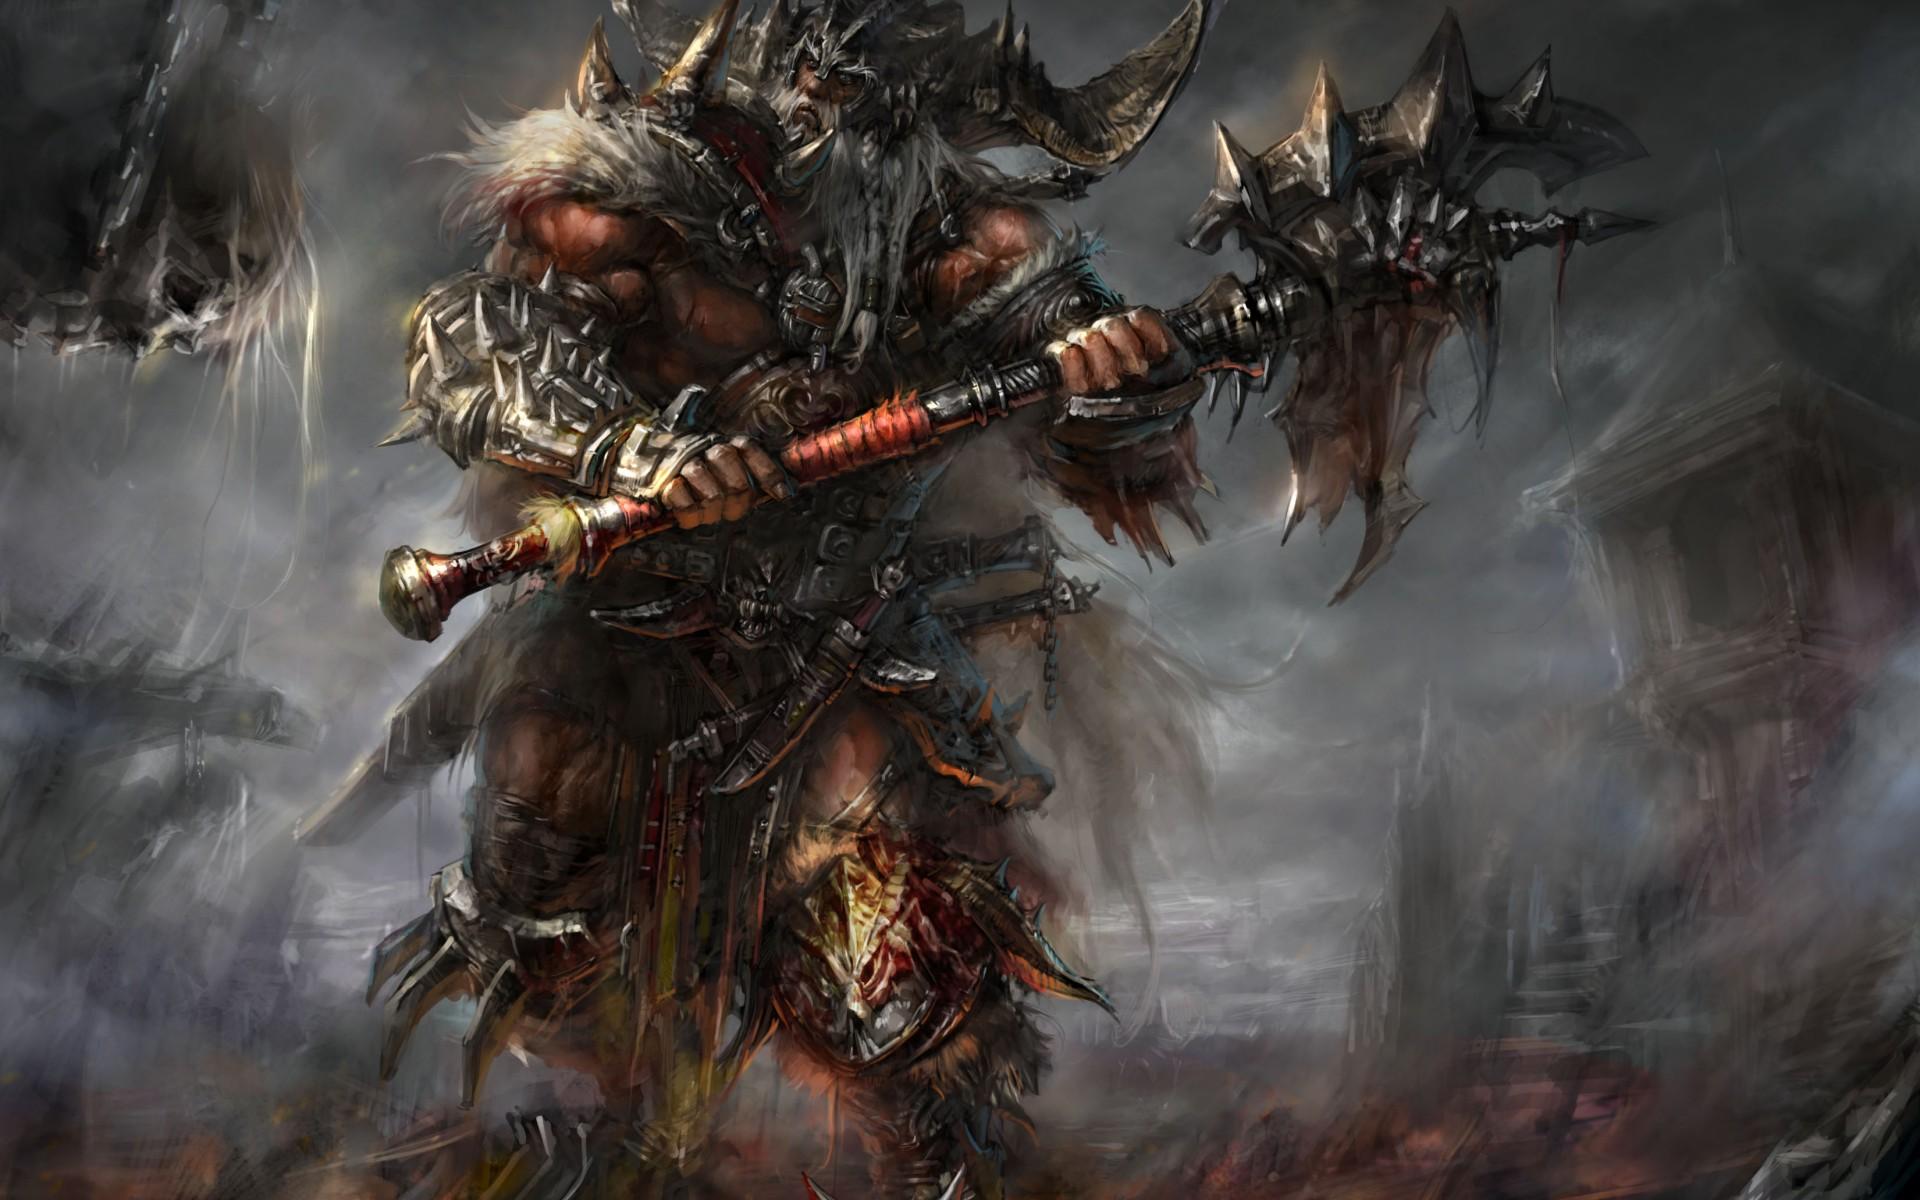 Diablo barbarian armor blood horns spikes ax undead warriors wallpaper 1920x1200